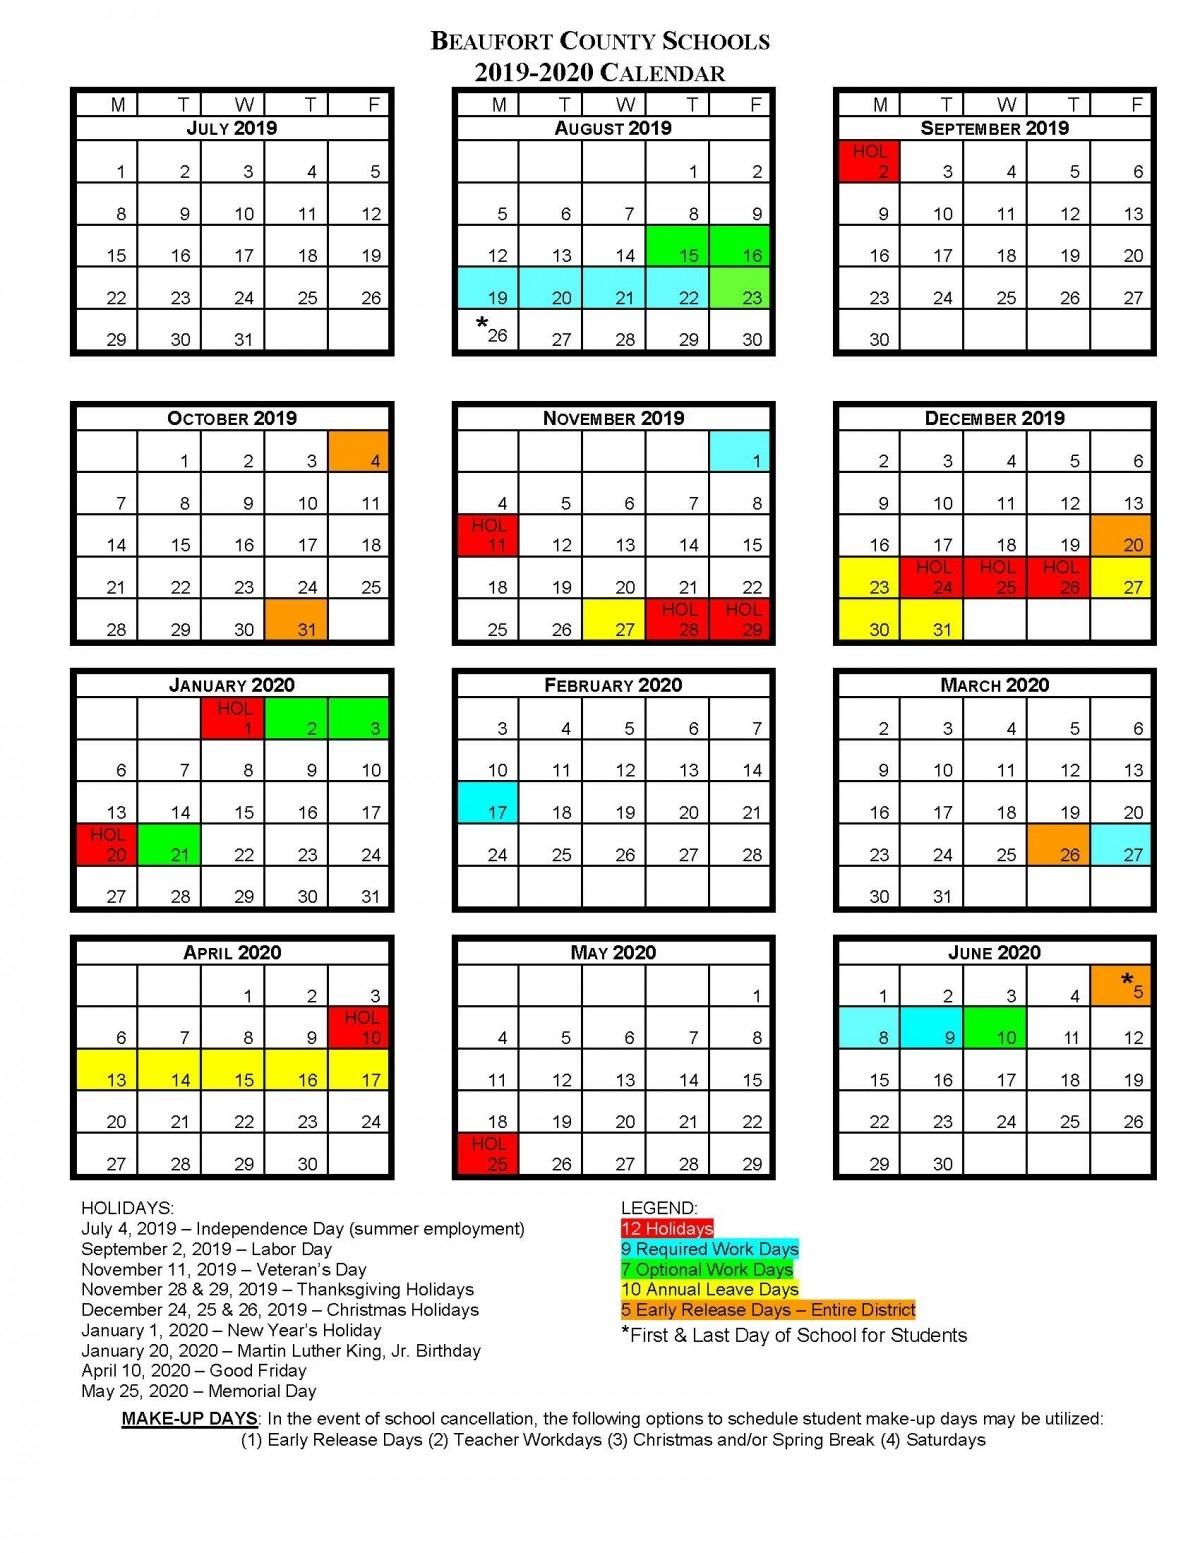 Bcs School Calendars | Beaufort County Schools Perky R-7 School District Calendar Jefferson County